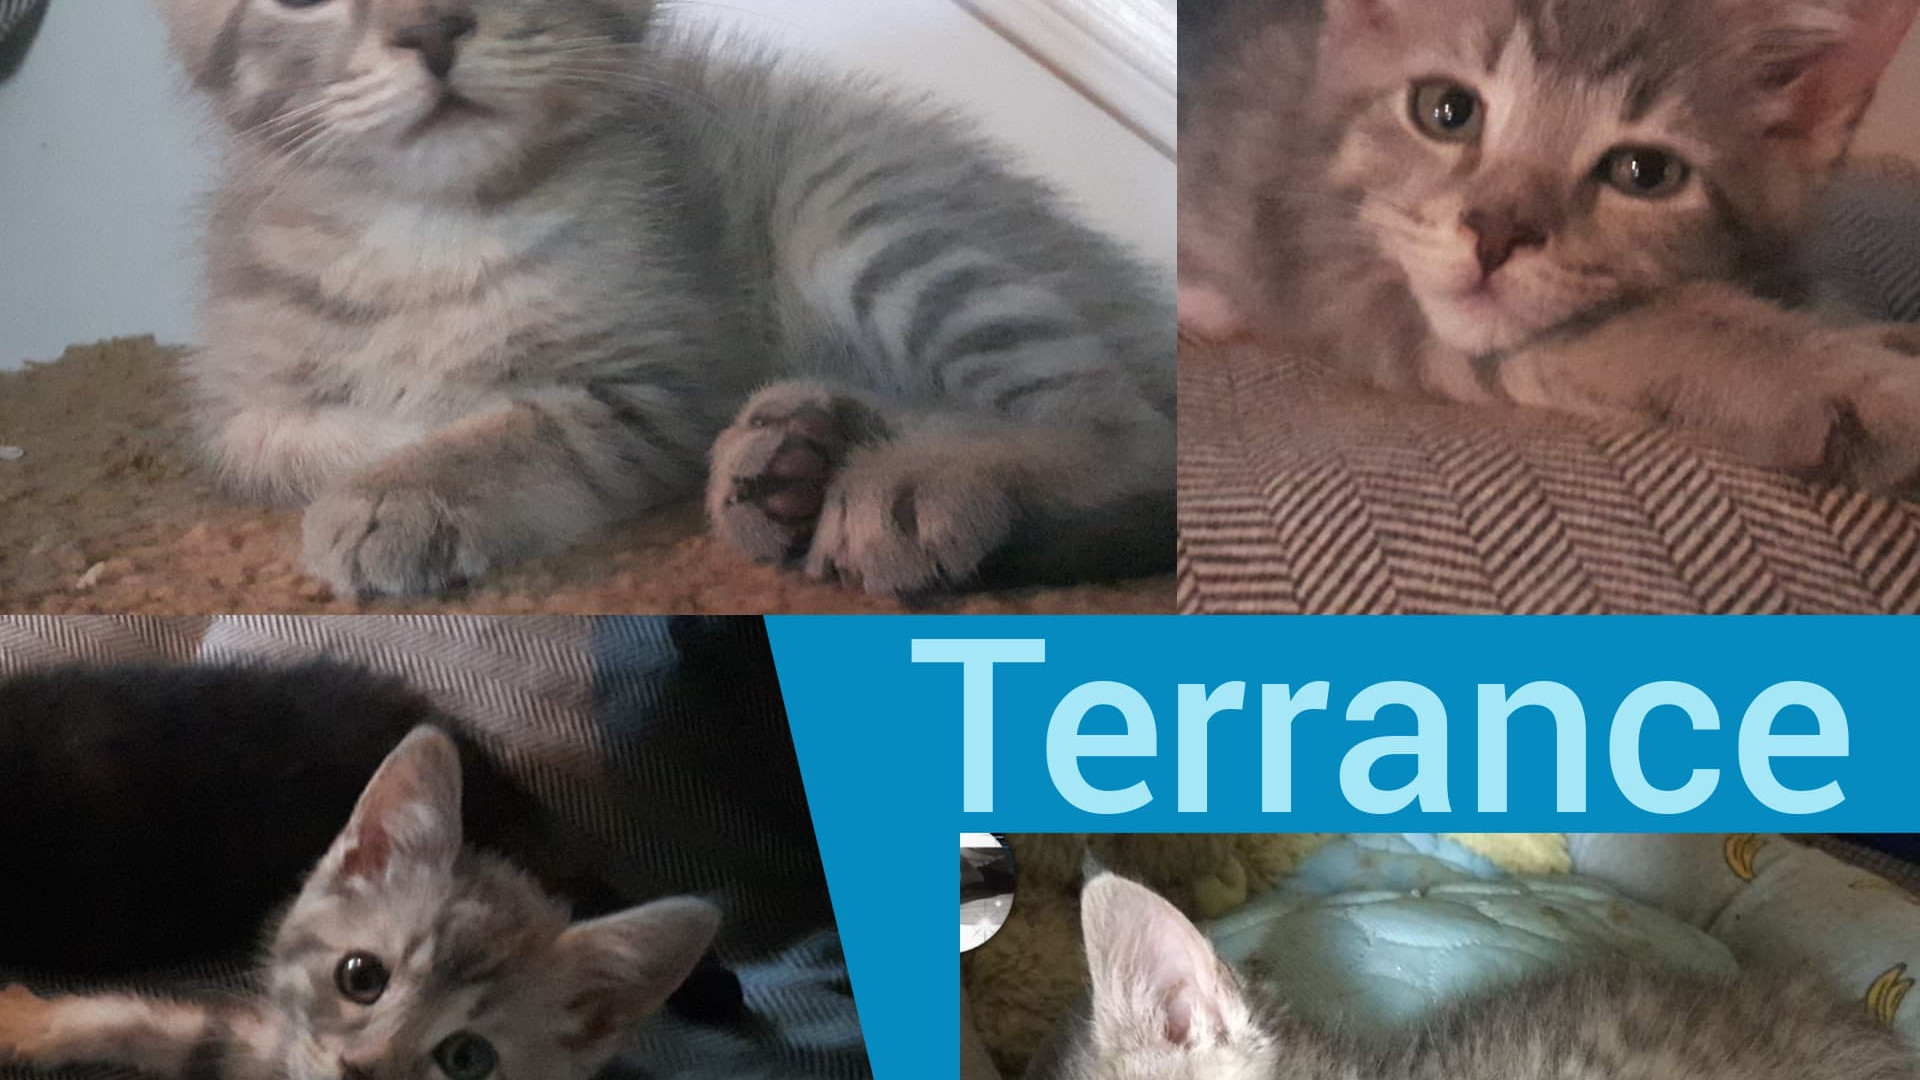 Terrance.jpg